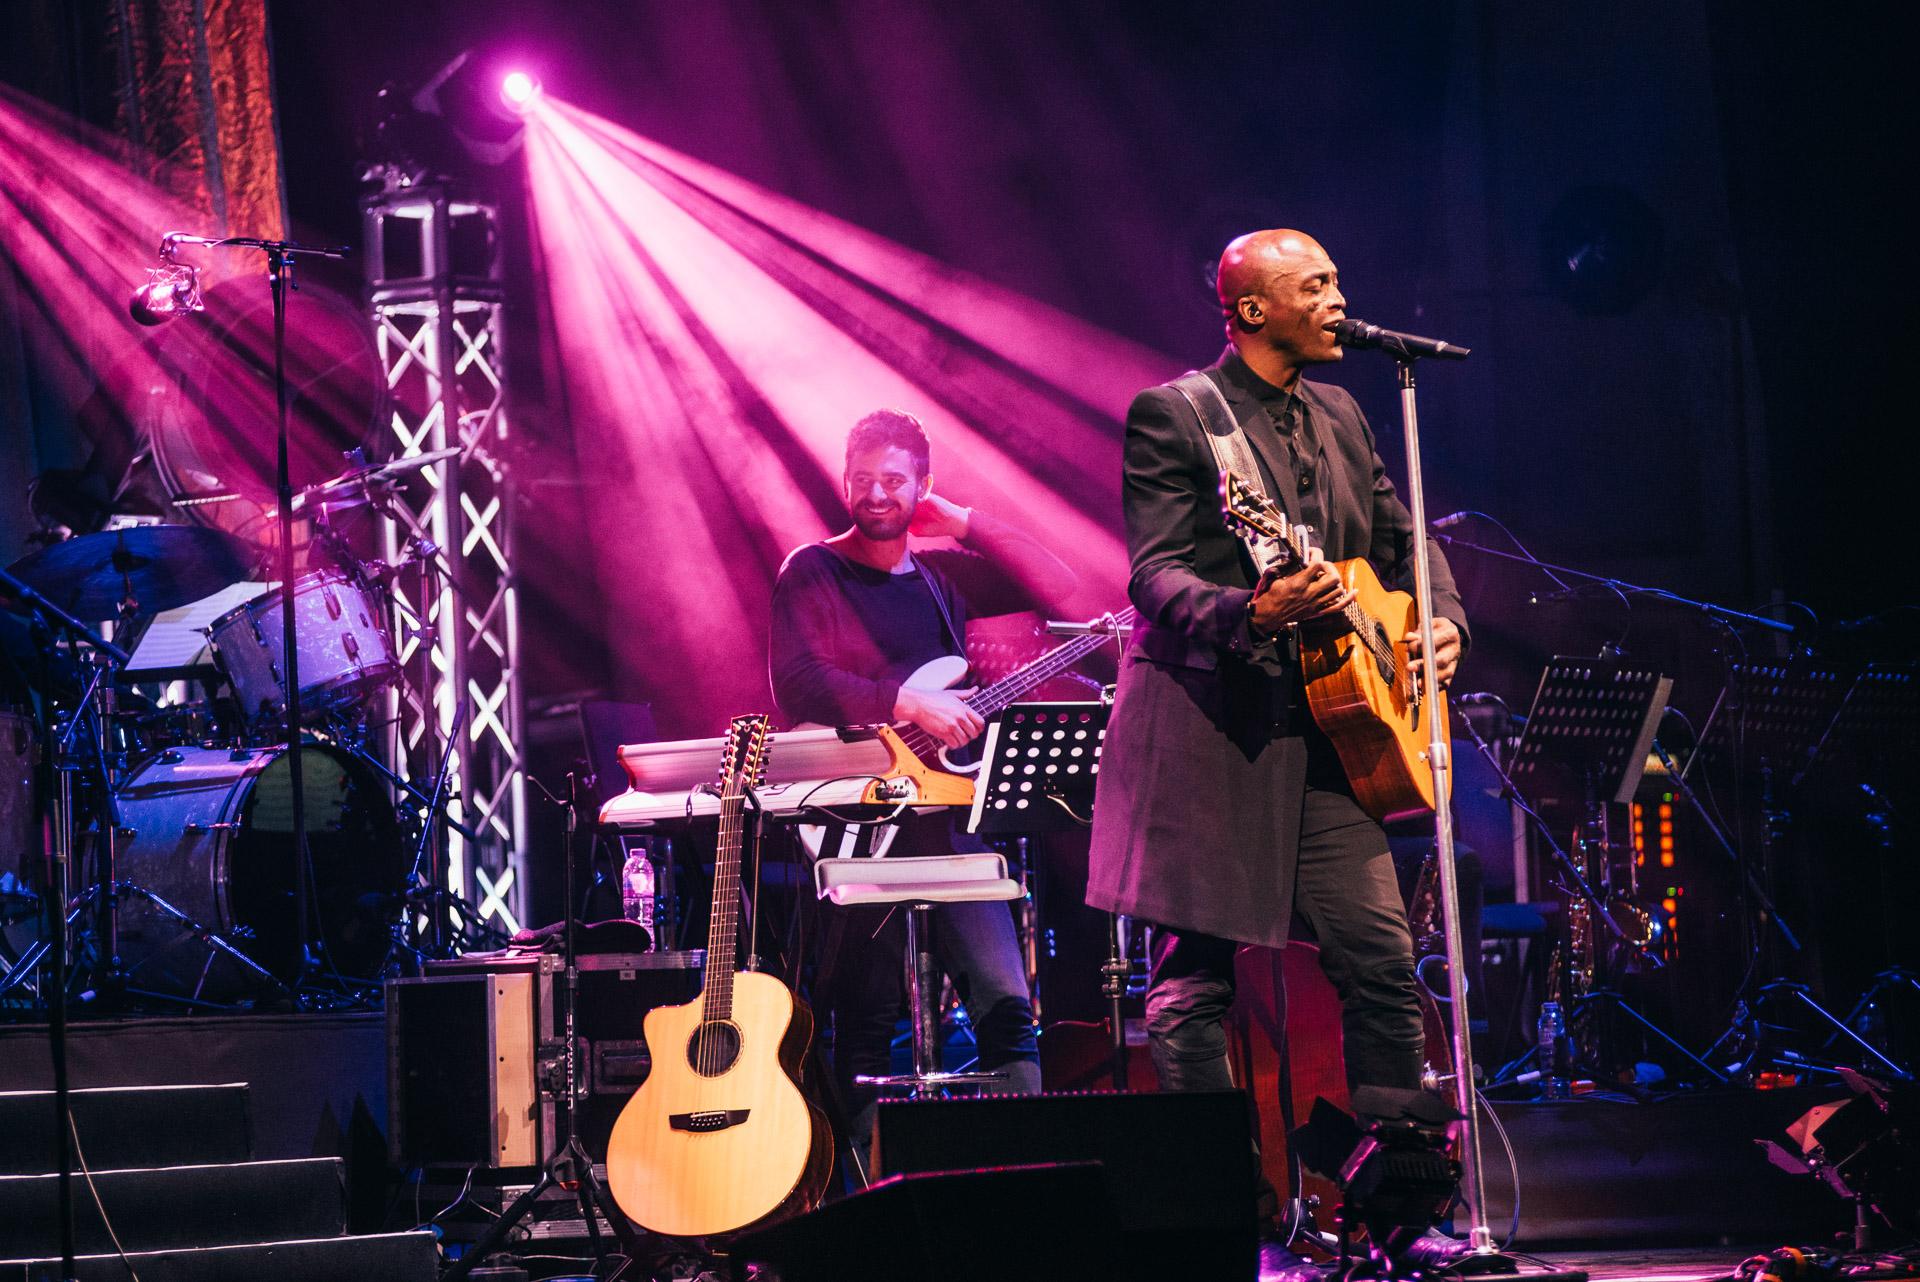 Seal live at Usher Hall